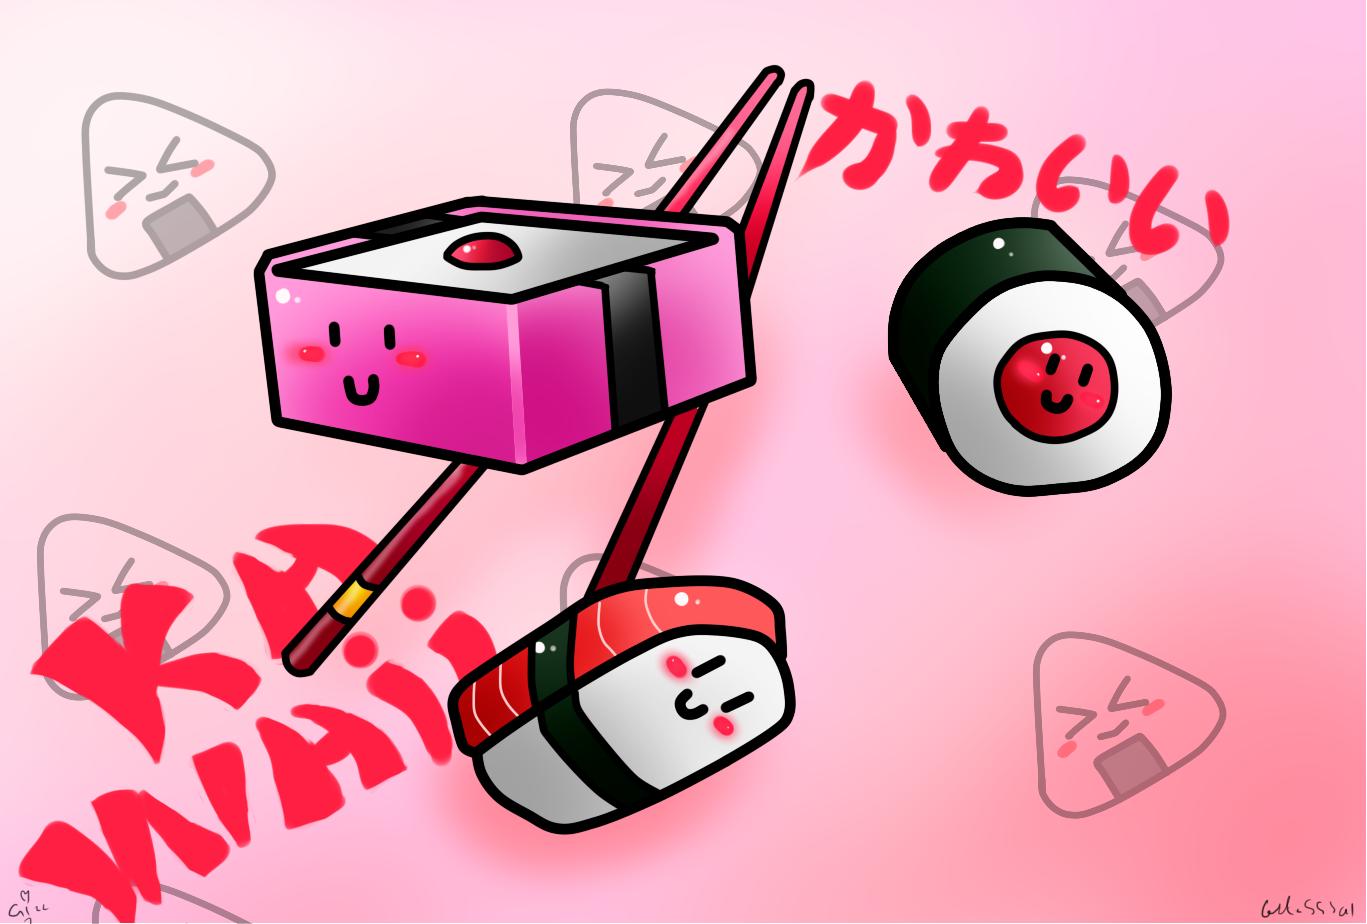 Espace Membre > Création : sushi bento maki kawaii onigiri 8D